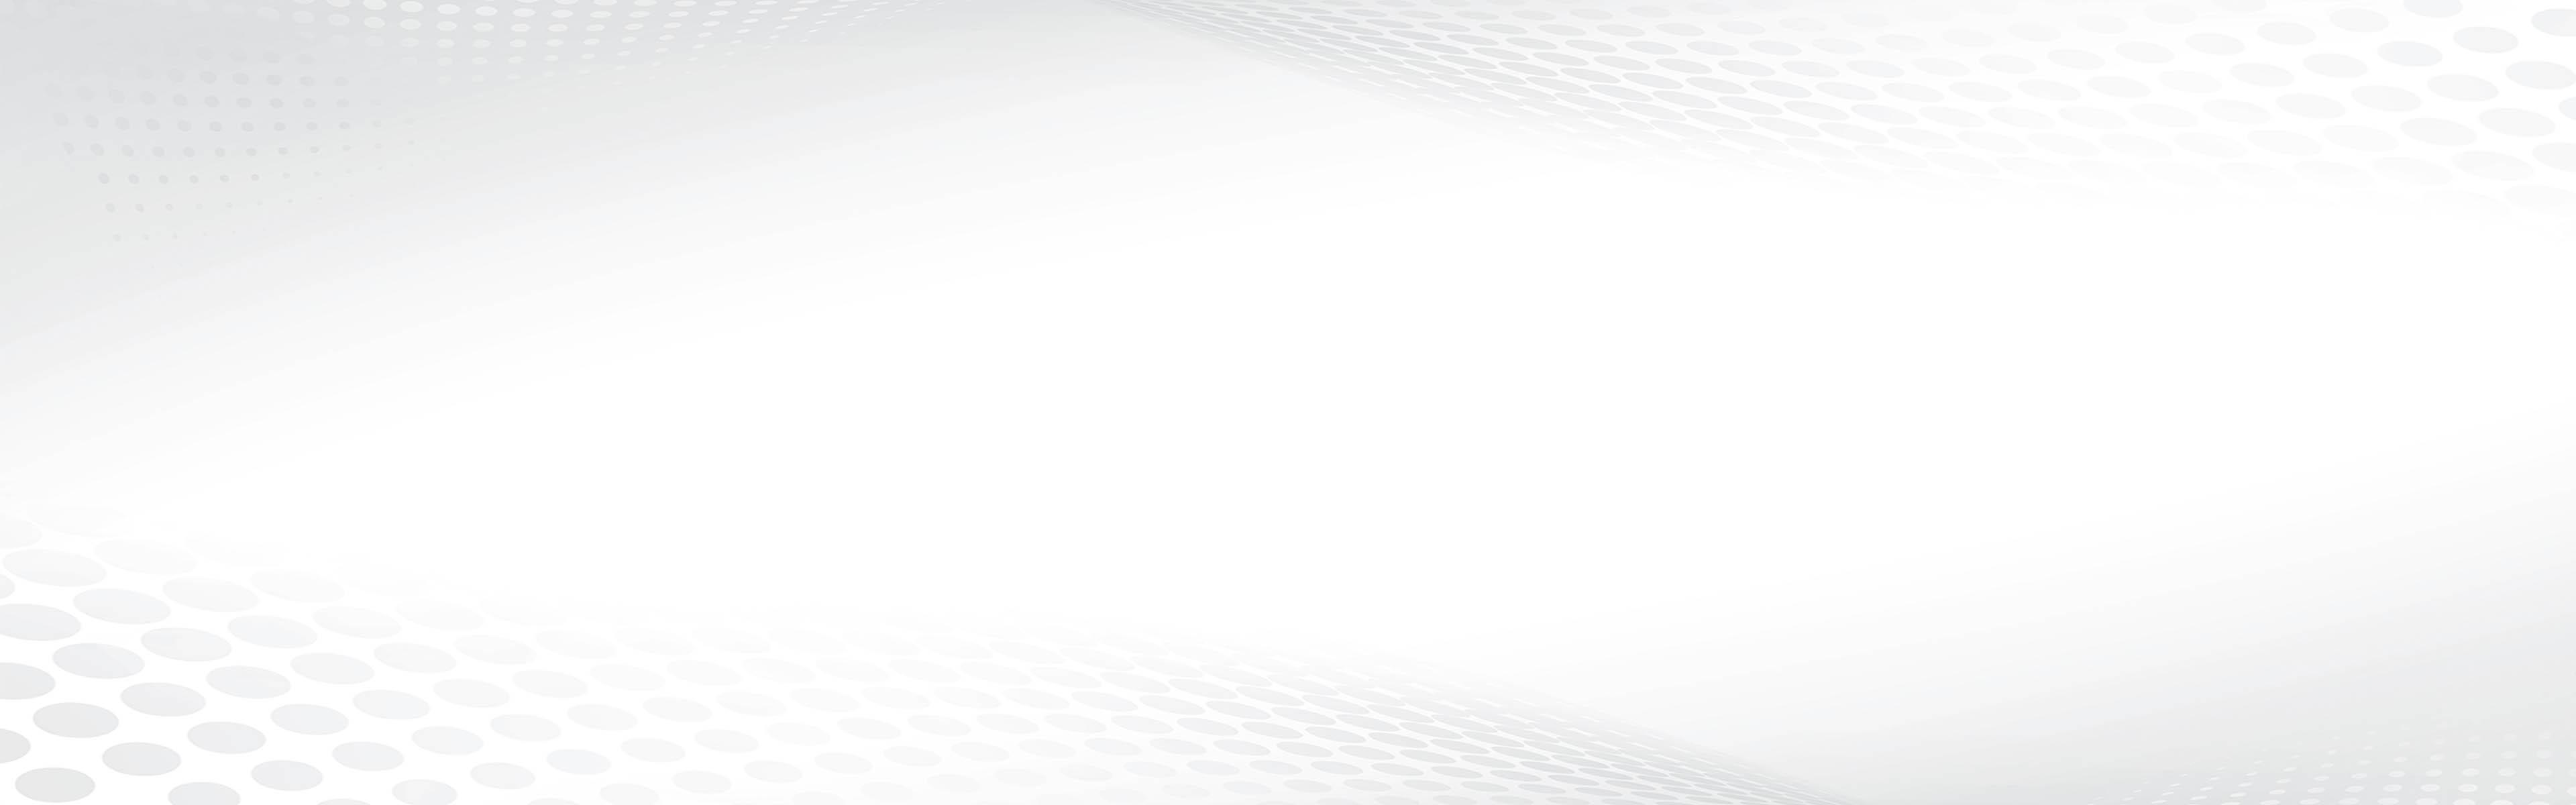 White tech background